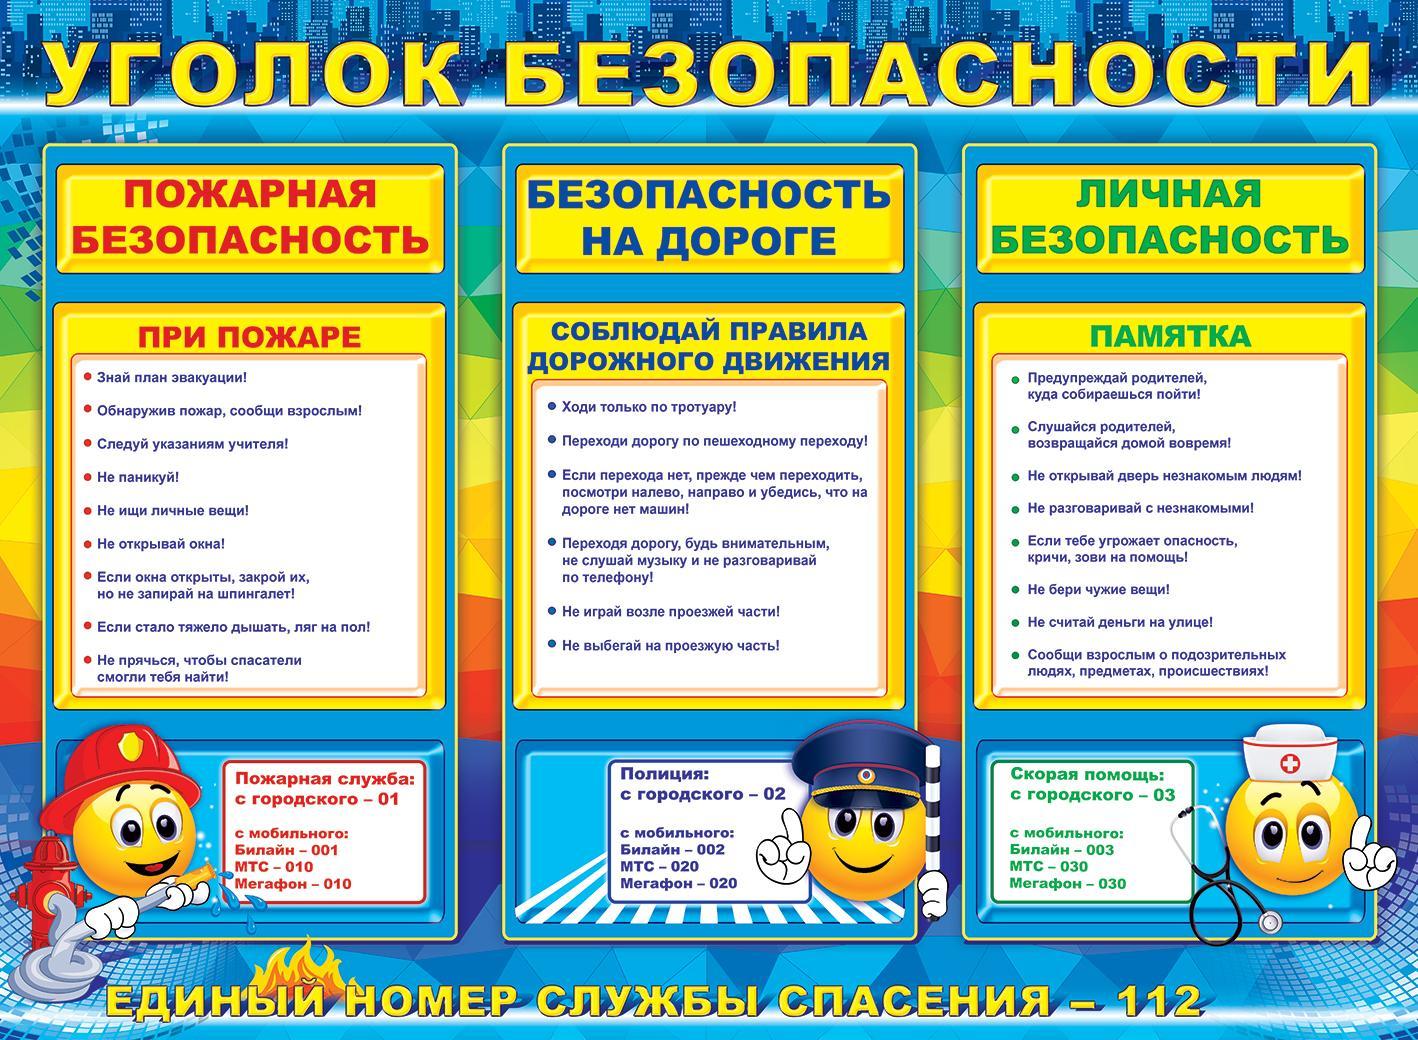 Картинки для уголка безопасности в школе